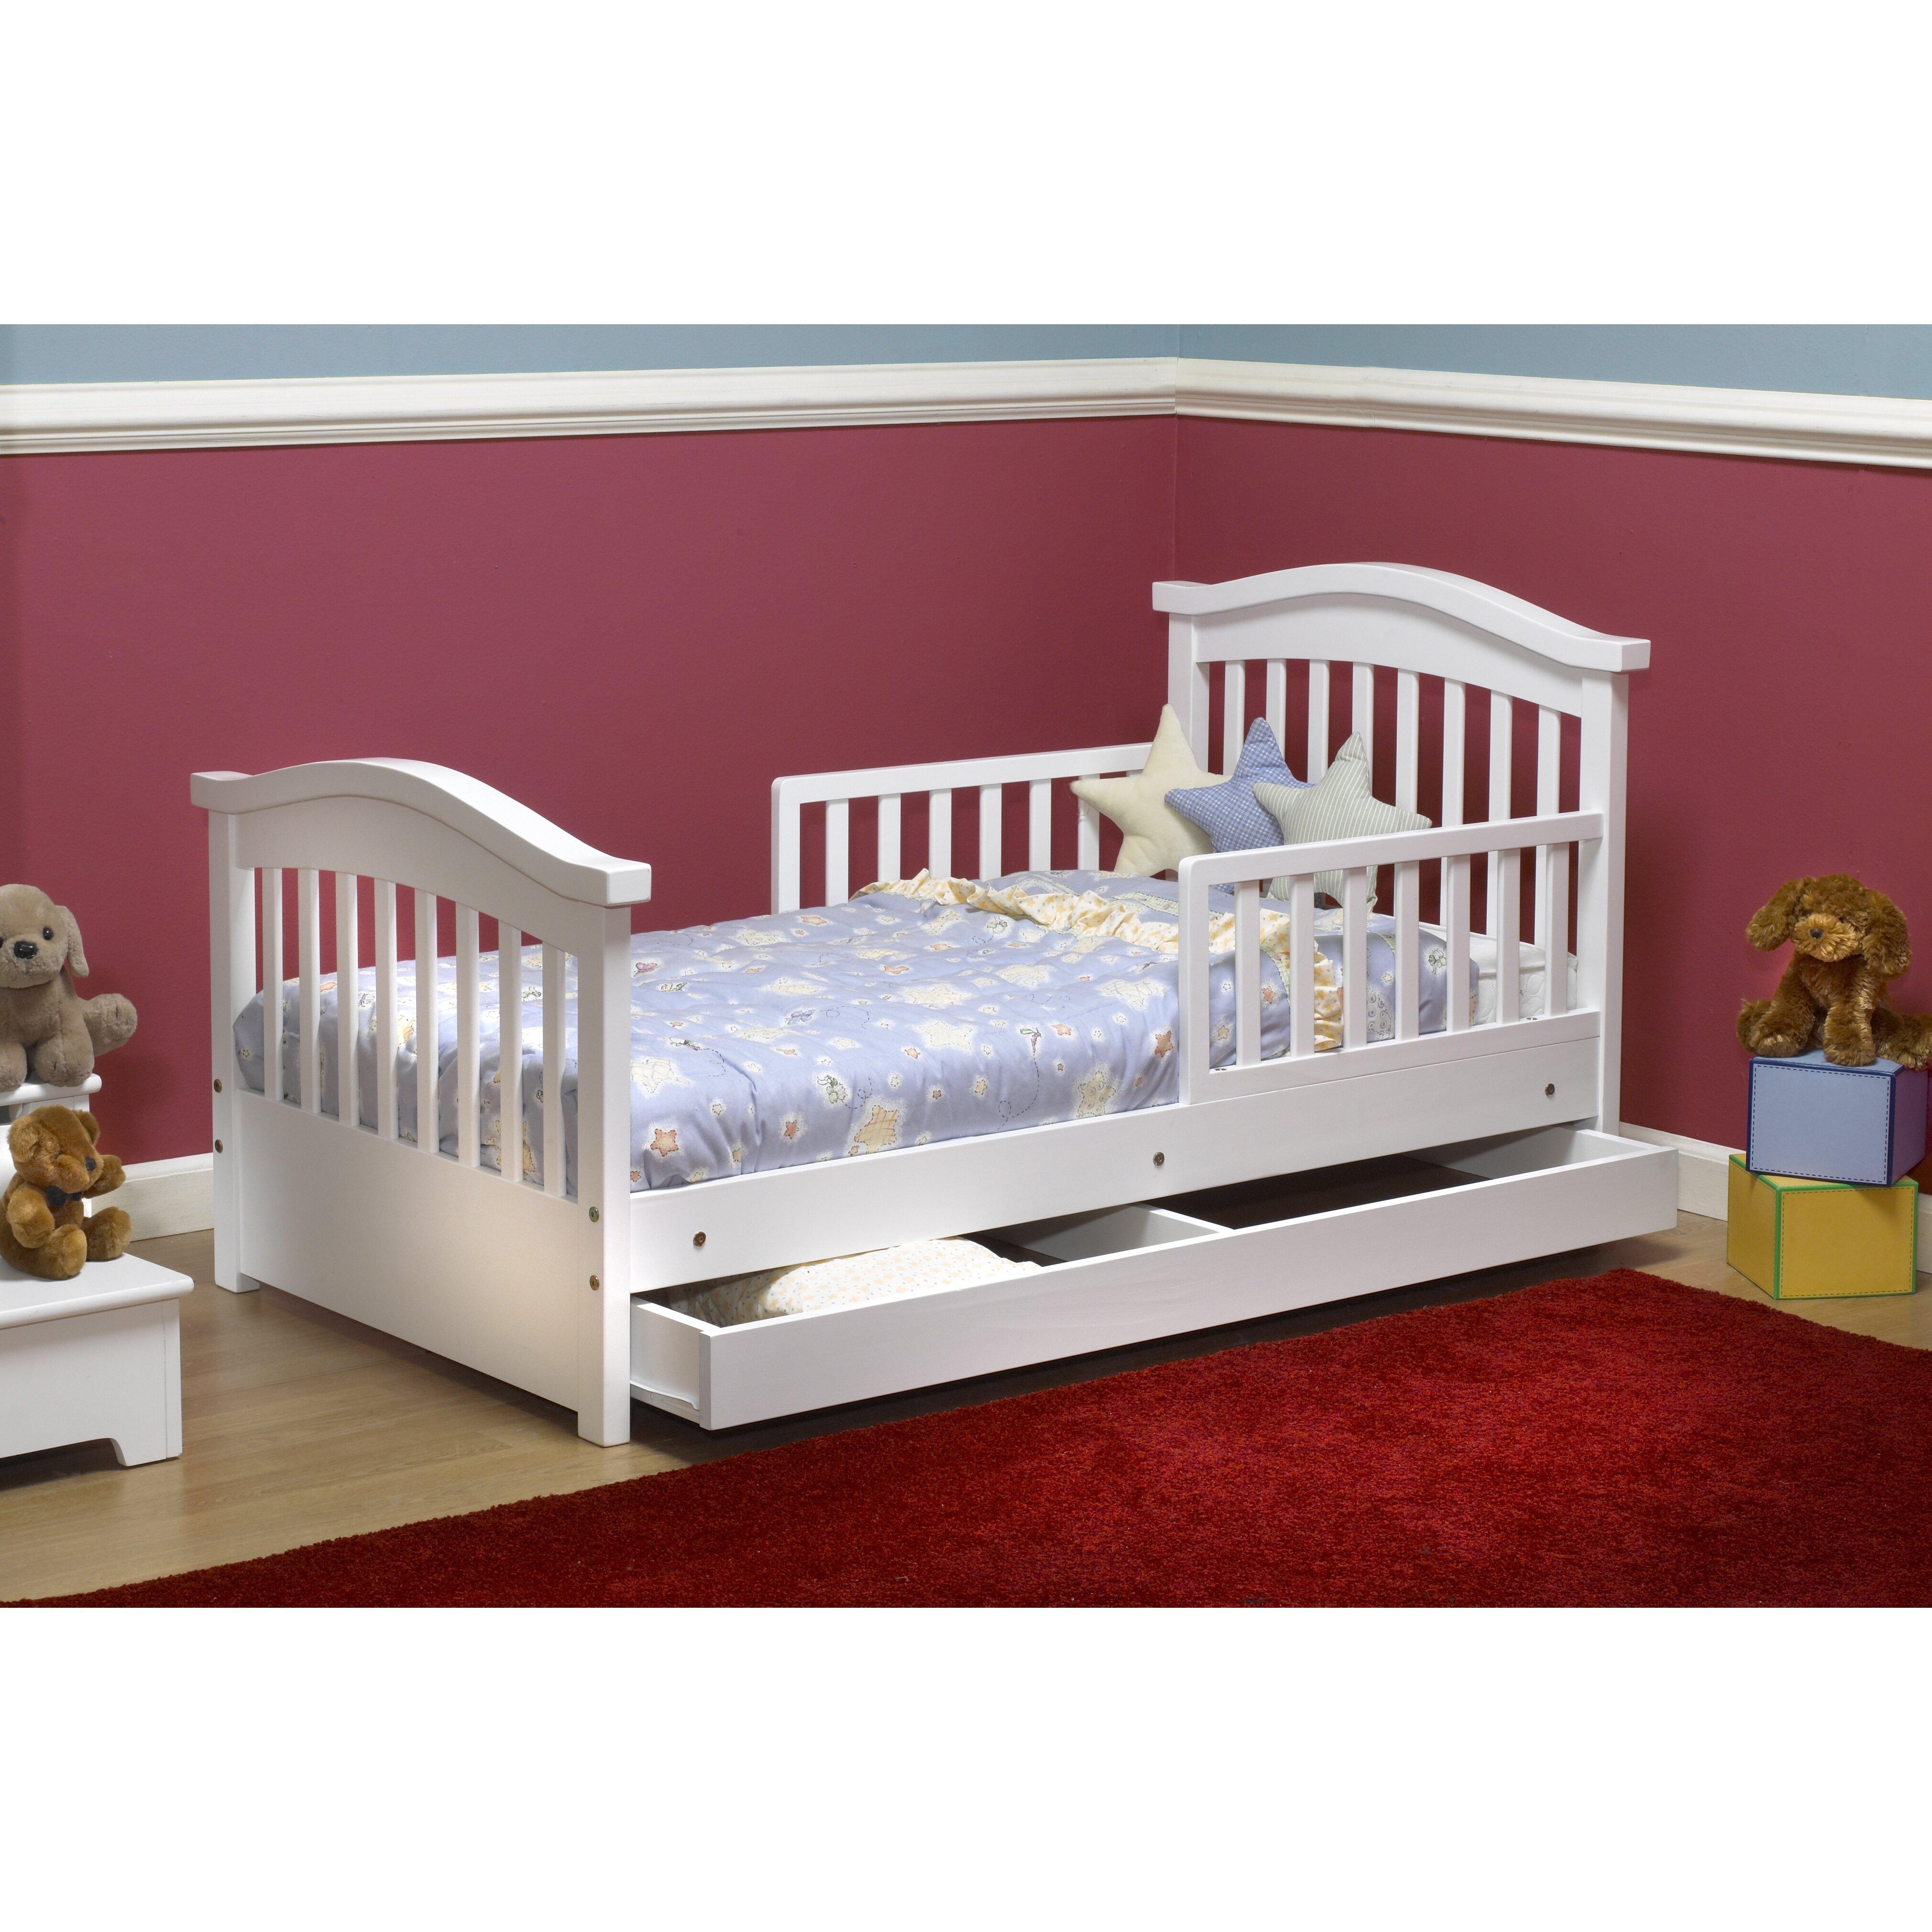 sorelle joel pine convertible toddler bed with storage reviews wayfair. Black Bedroom Furniture Sets. Home Design Ideas